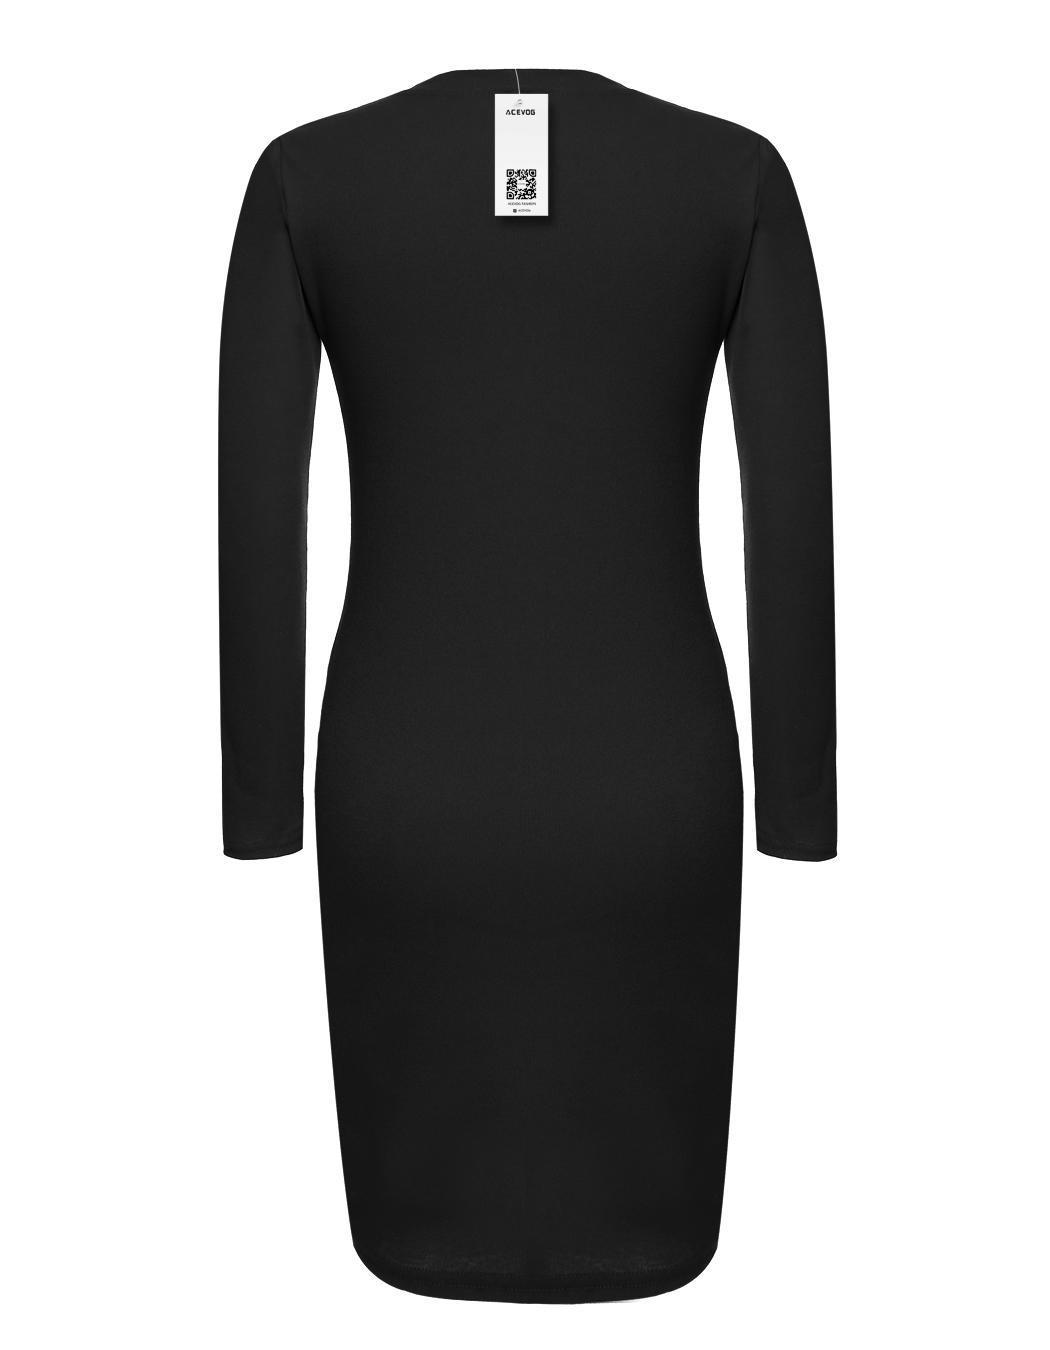 Women Career Long Sleeve Stretch Bodycon Slim Dress 4